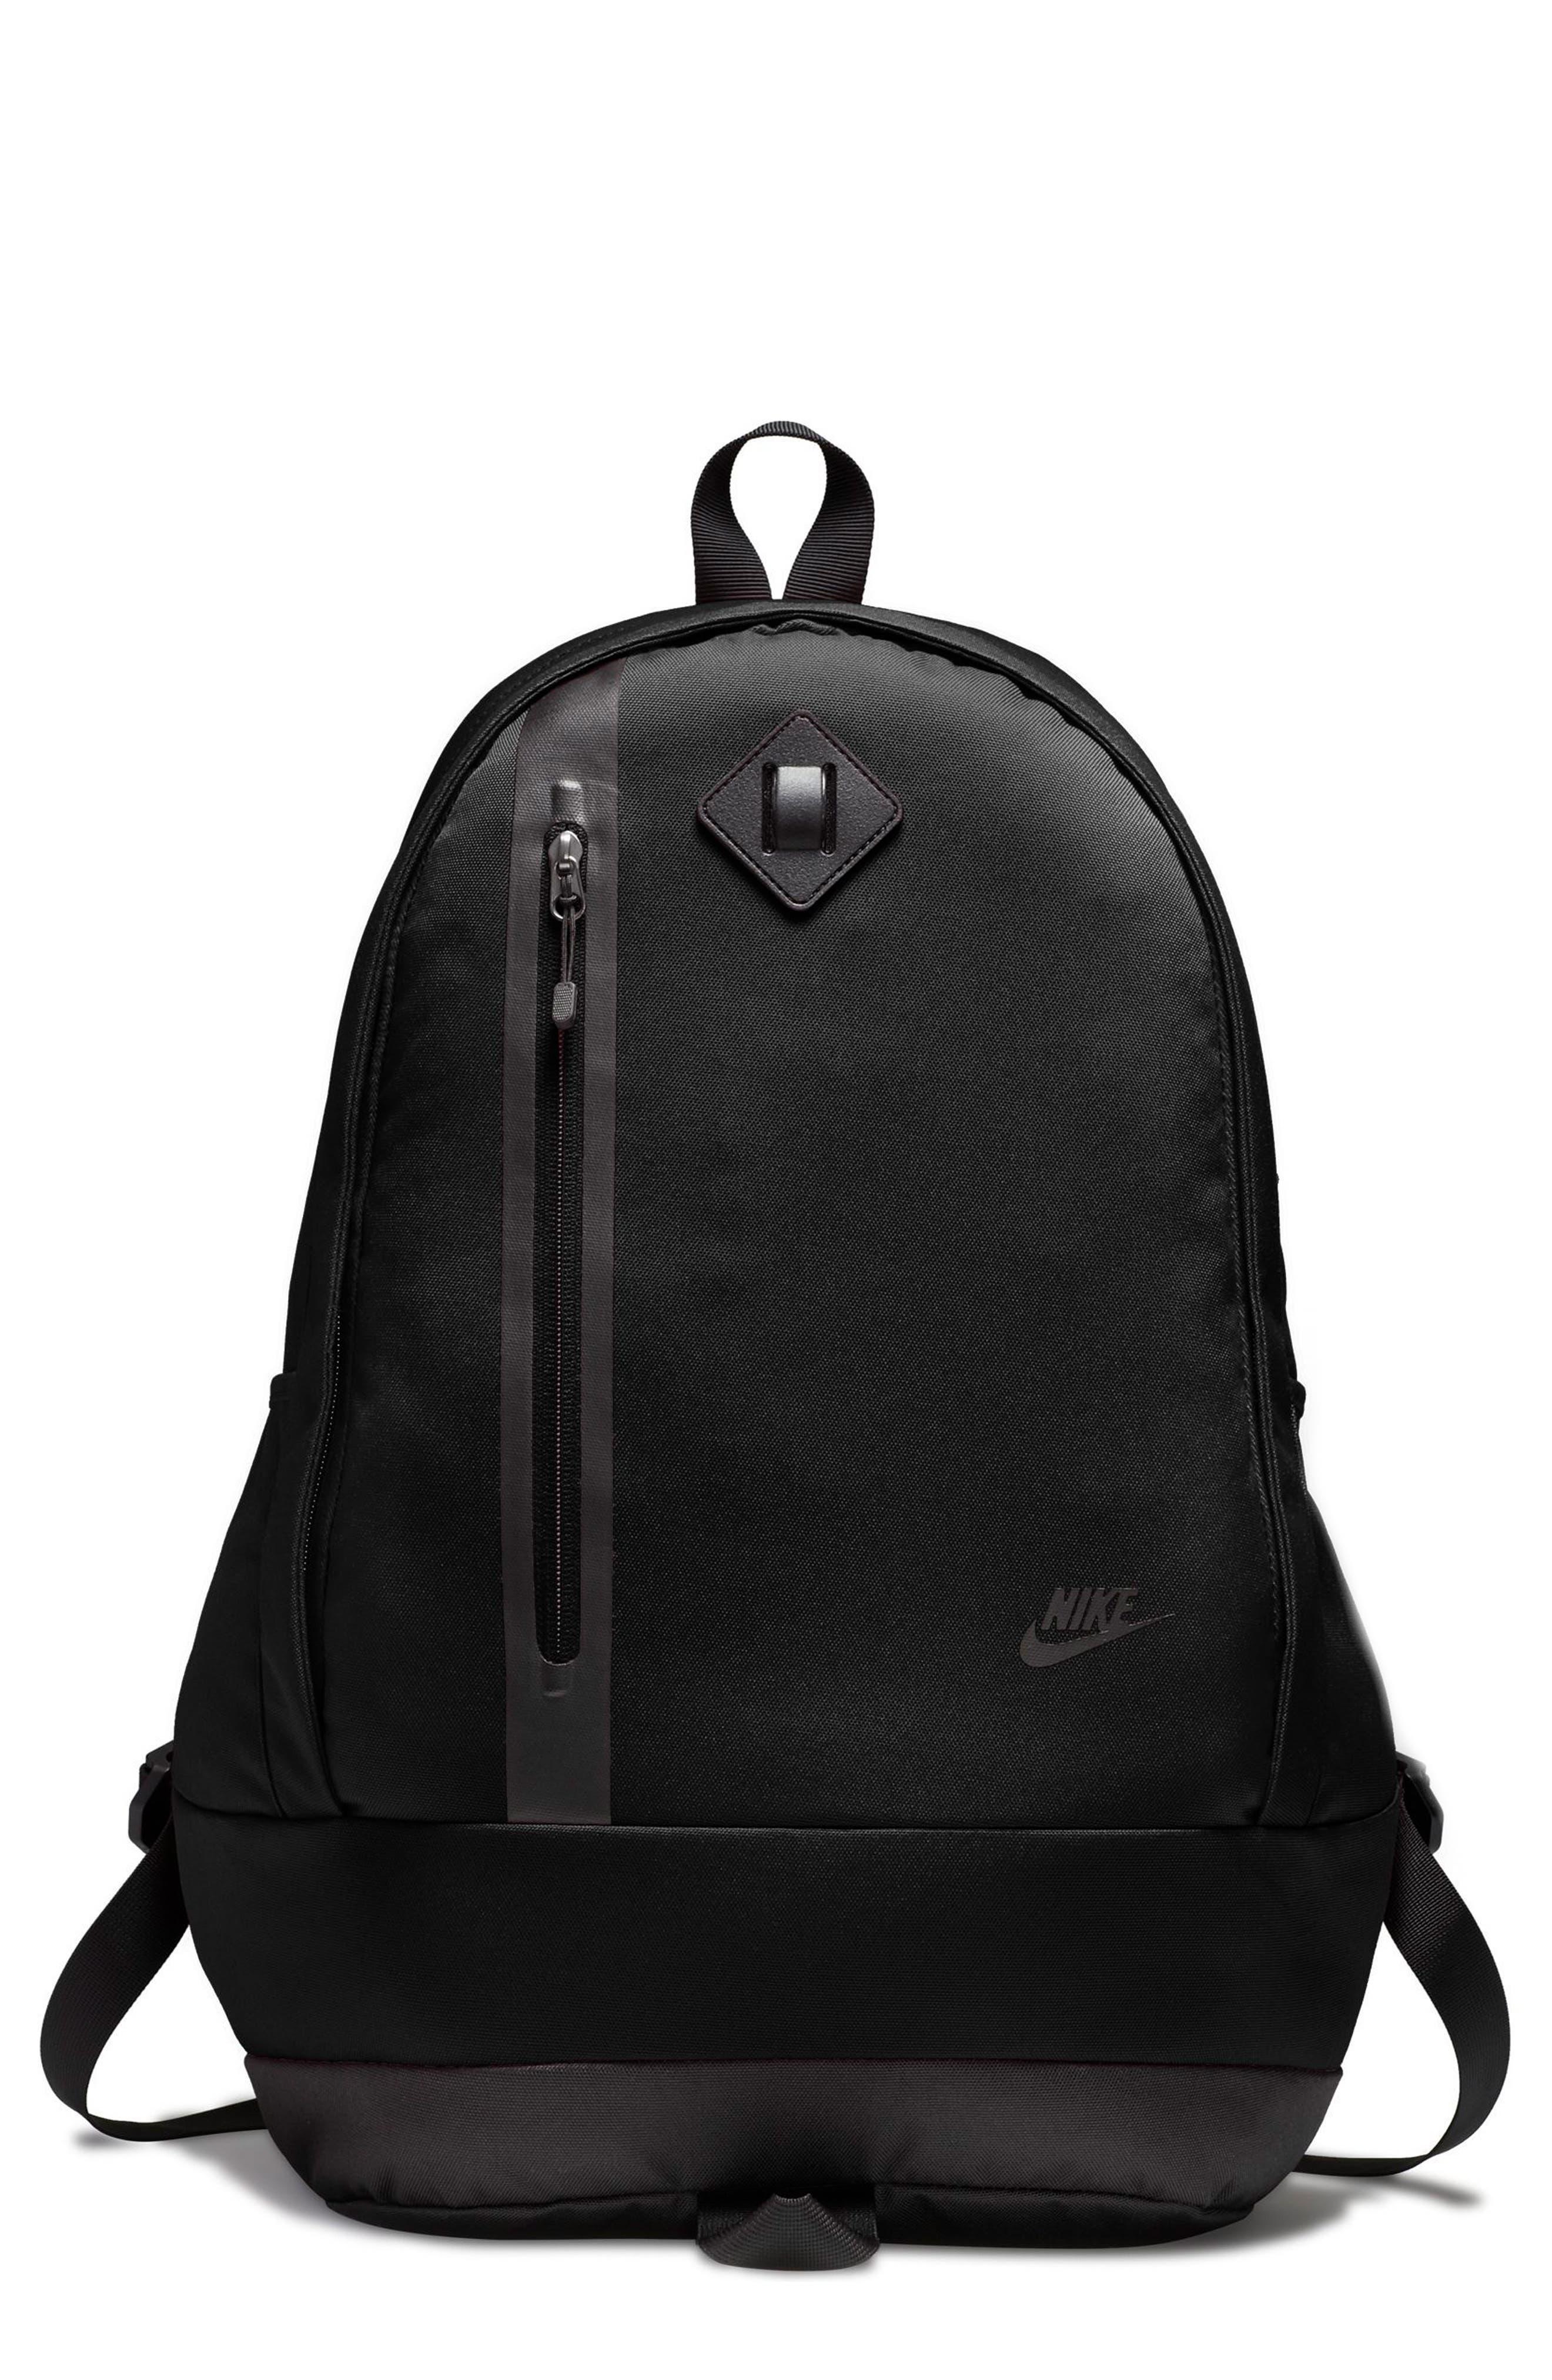 Cheyenne Backpack,                             Main thumbnail 1, color,                             Black/ Black/ Black